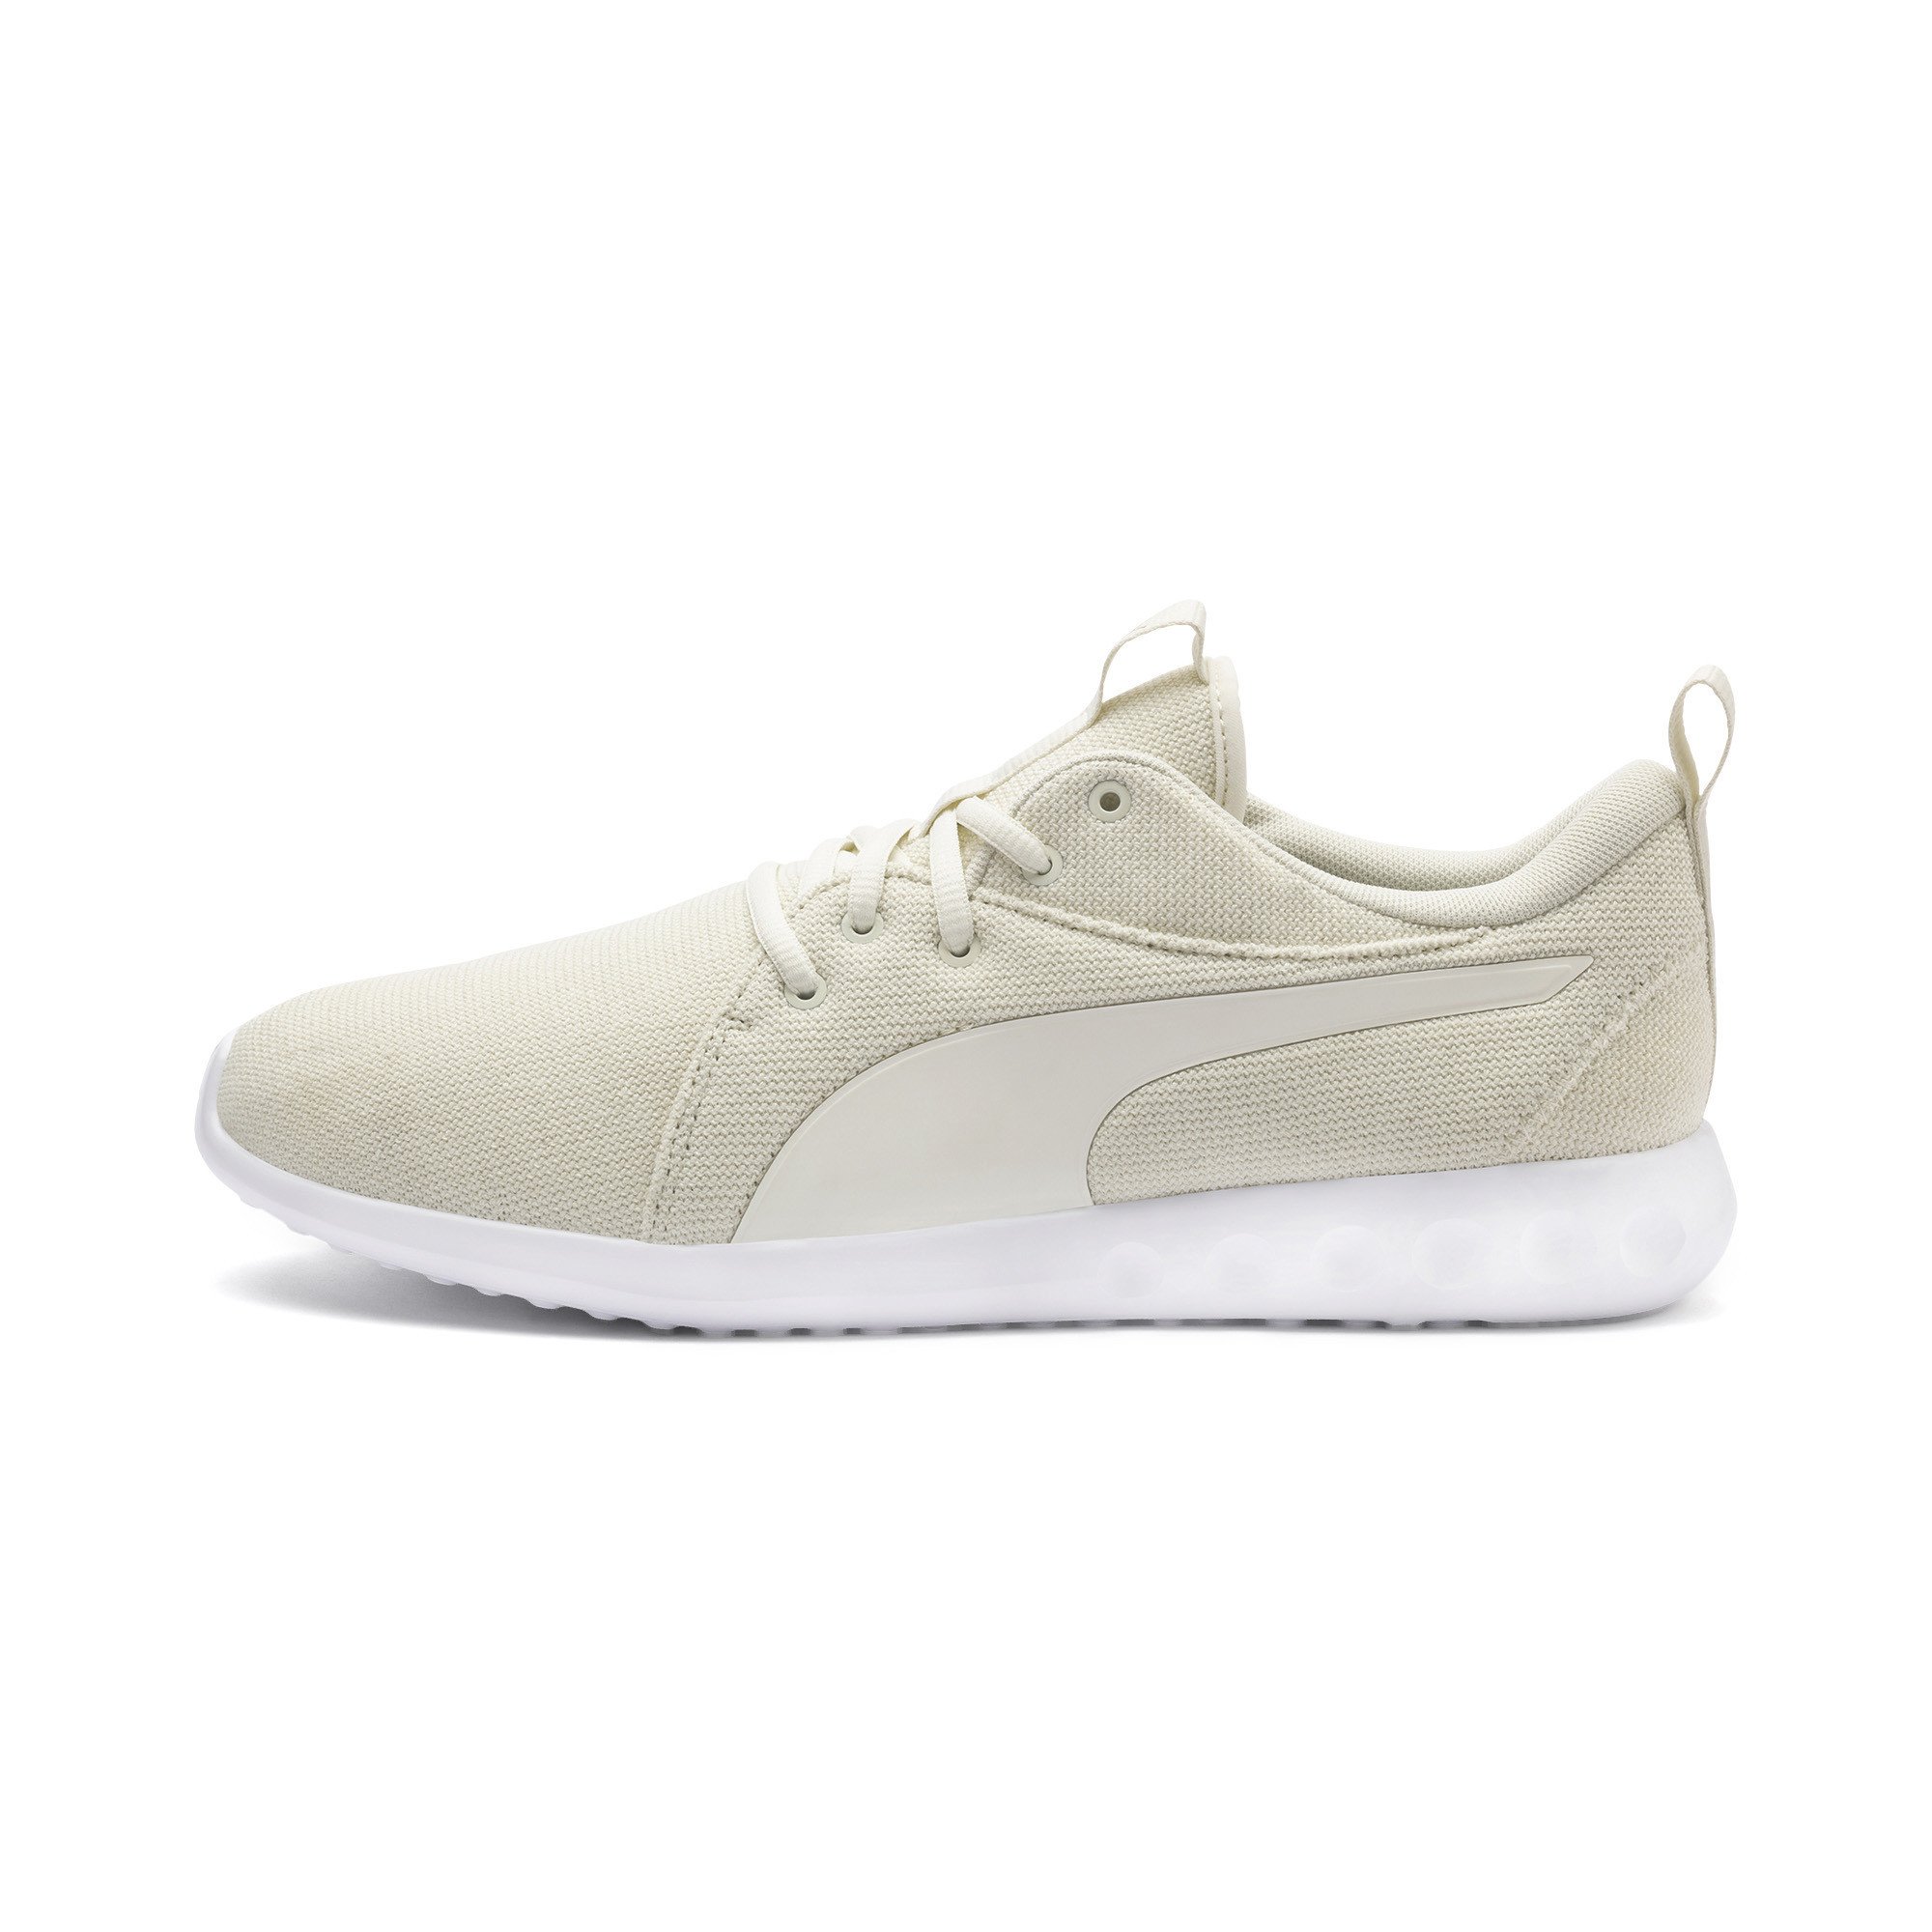 PUMA-Carson-2-Knit-Men-039-s-Training-Shoes-Men-Shoe-Running thumbnail 8